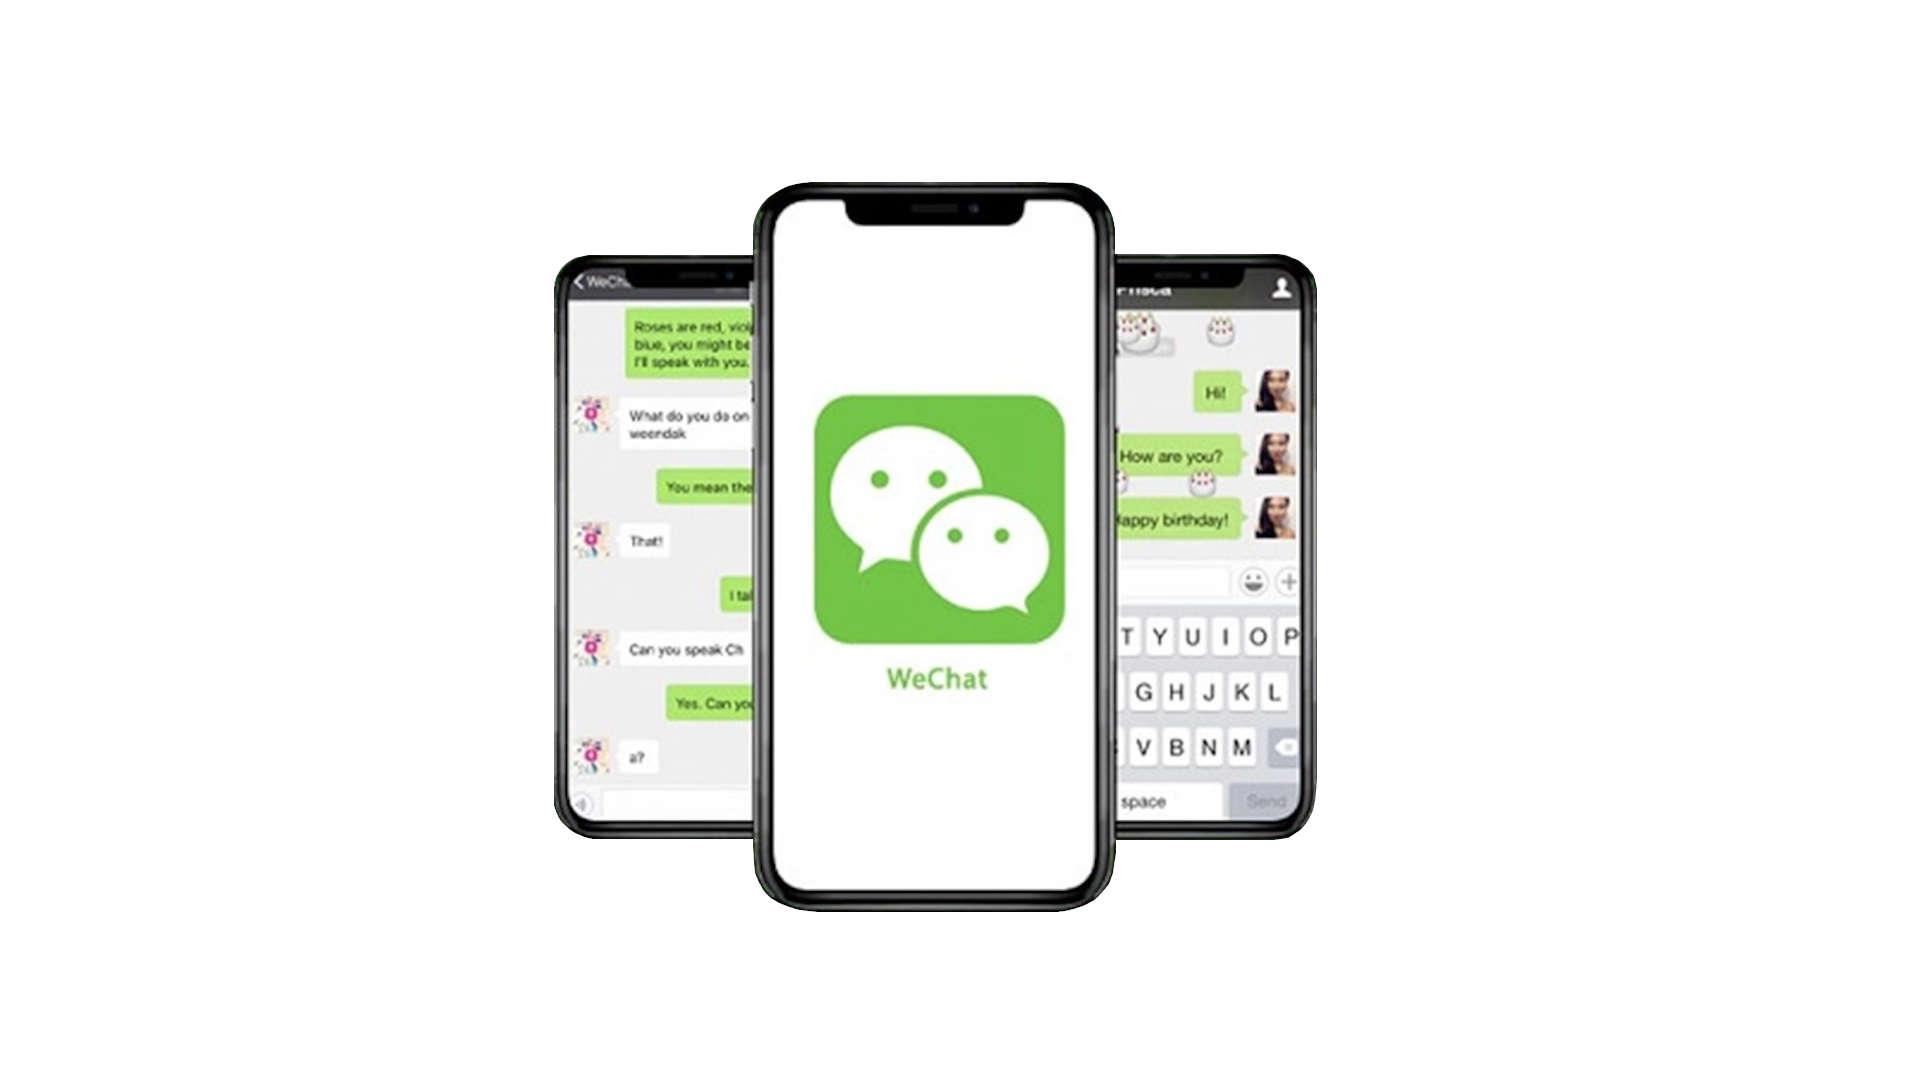 wechat apple iphone